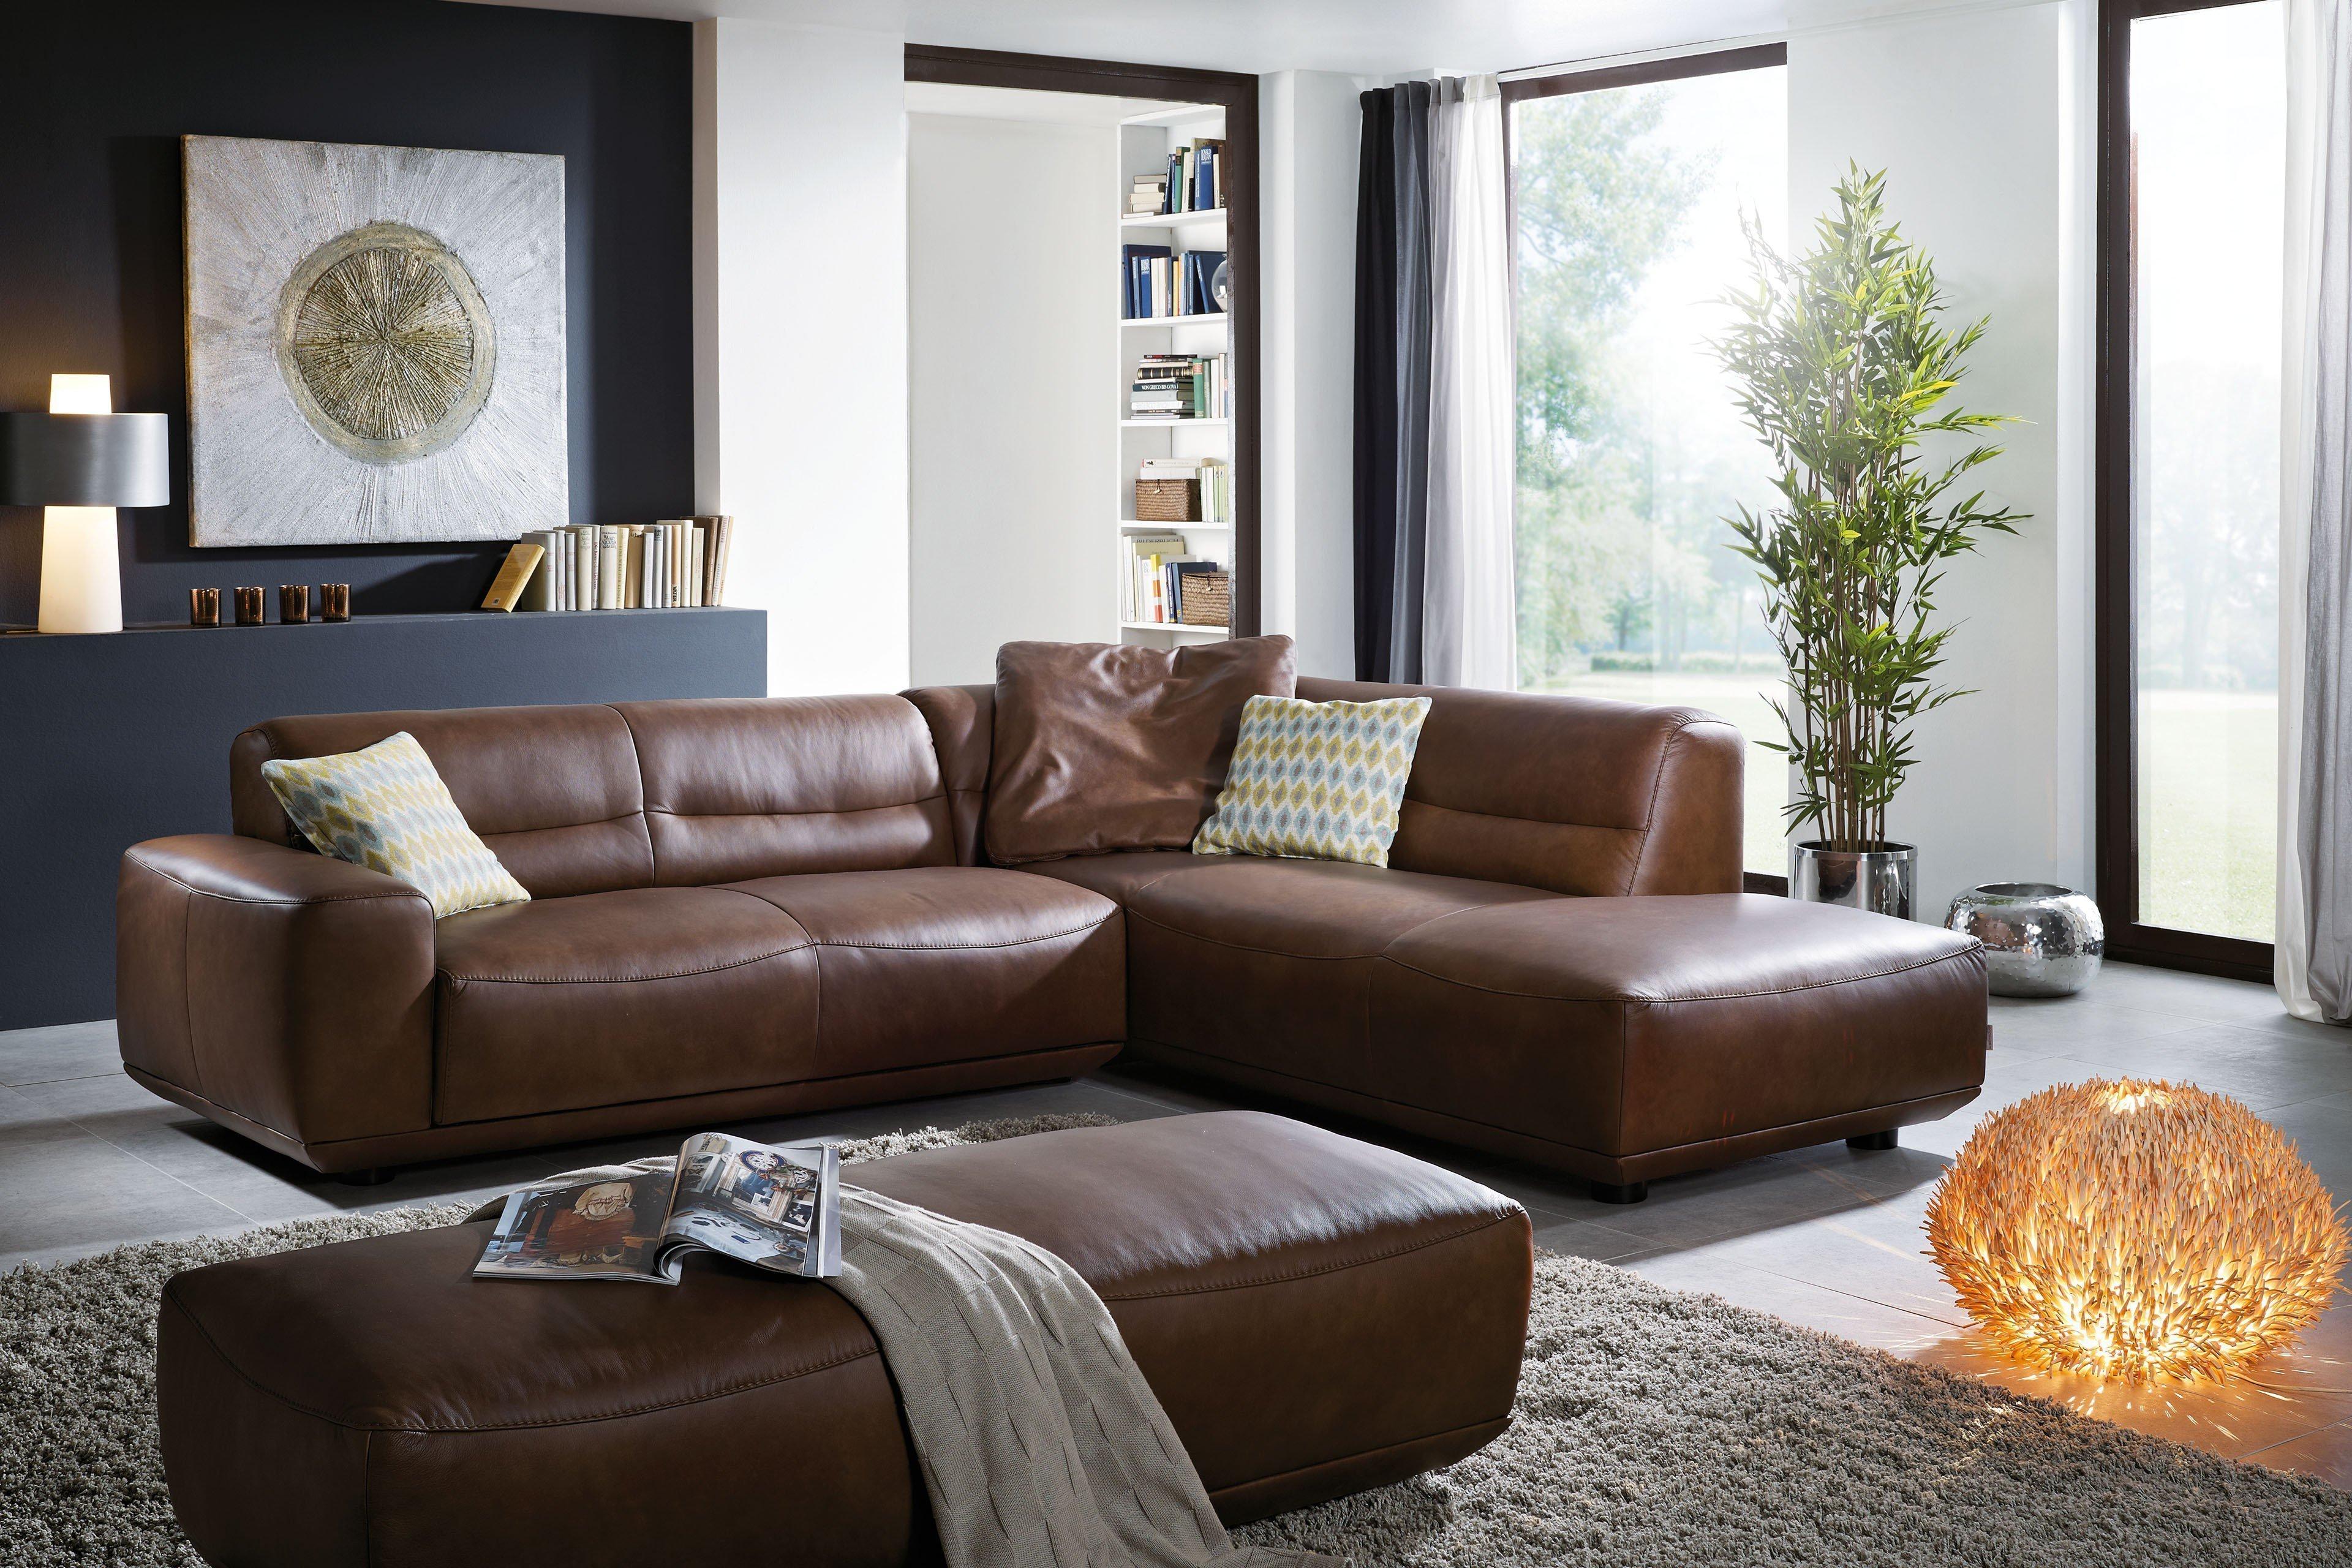 meubles braun fribourg awesome simple mobel braun freiburg schlafsofa planen mobel braun. Black Bedroom Furniture Sets. Home Design Ideas